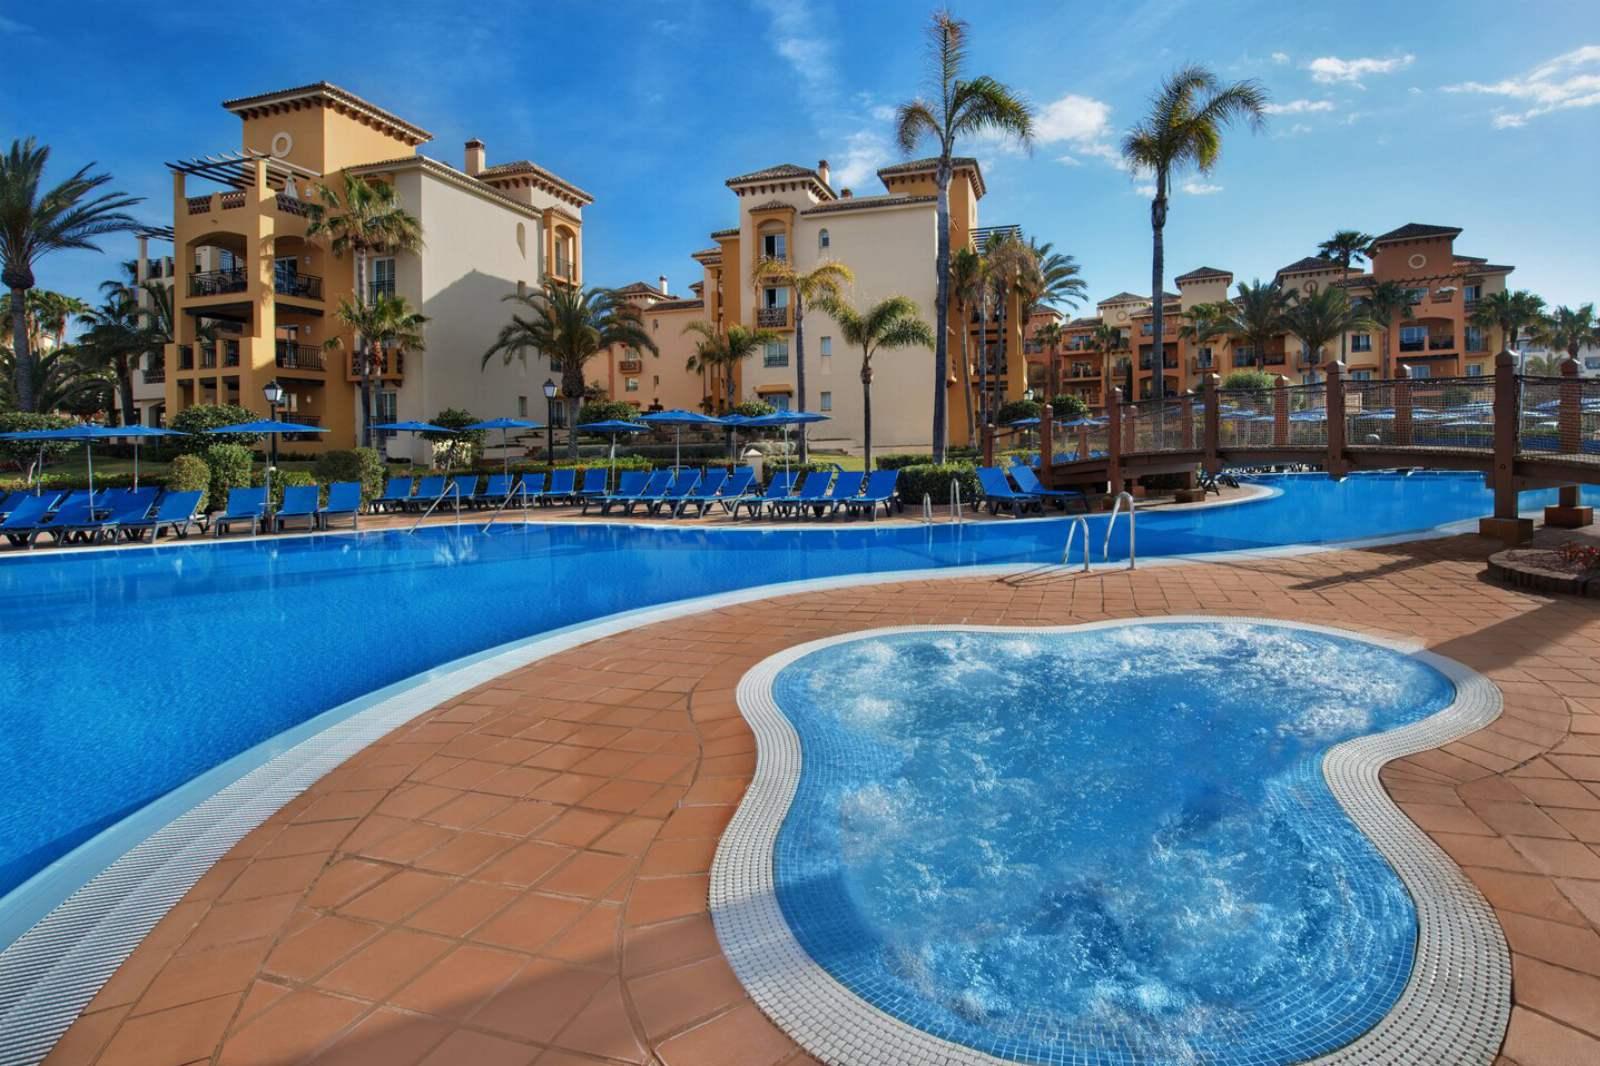 Marriott's Marbella Beach Resort - Whirlpool Spa